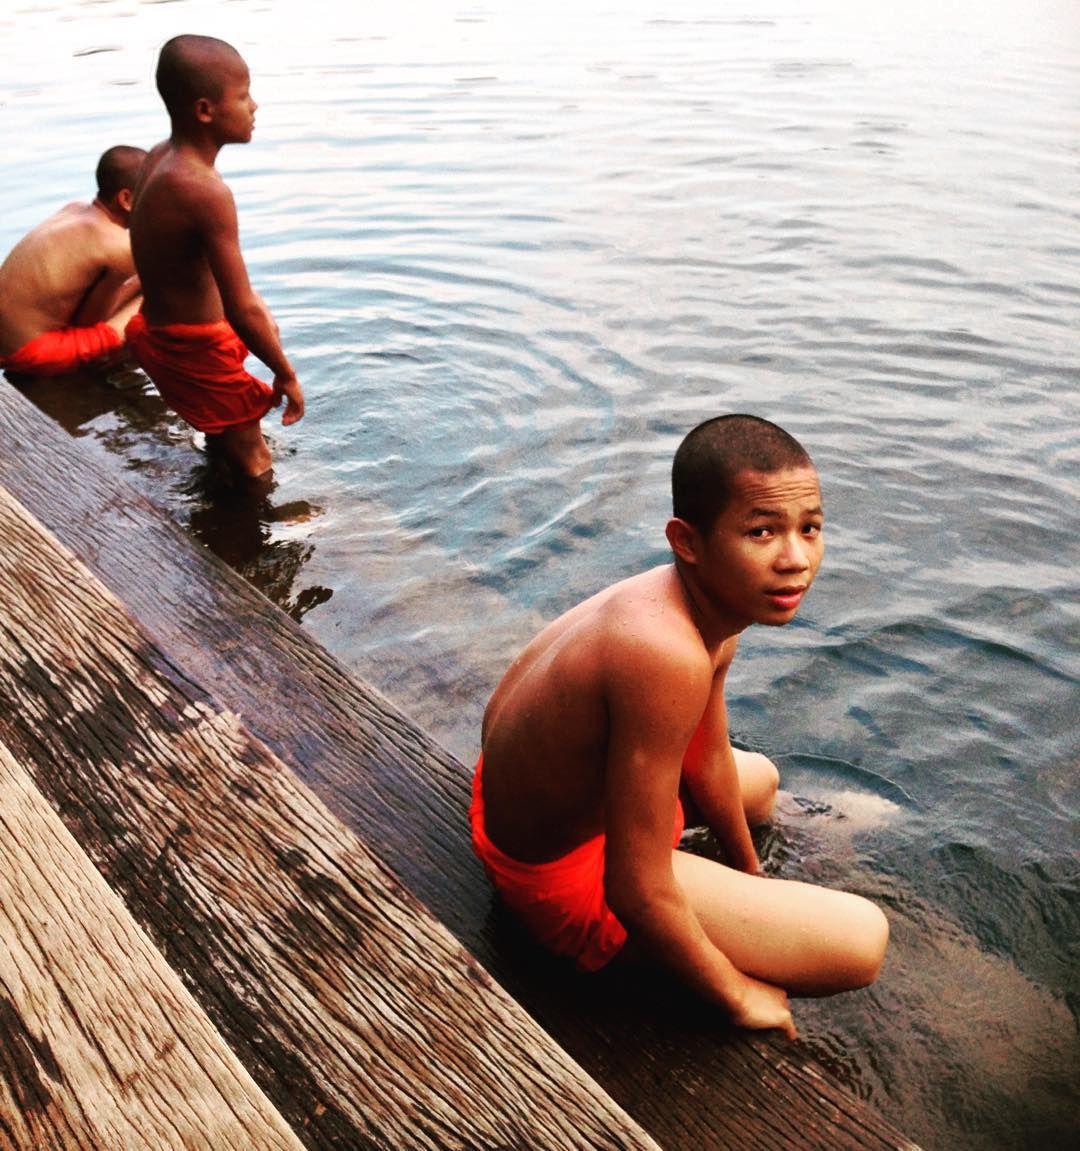 #Budist #monks #Swimming in a #crater of #ratanakiri #yaklaom #lake by enclavedeviaje